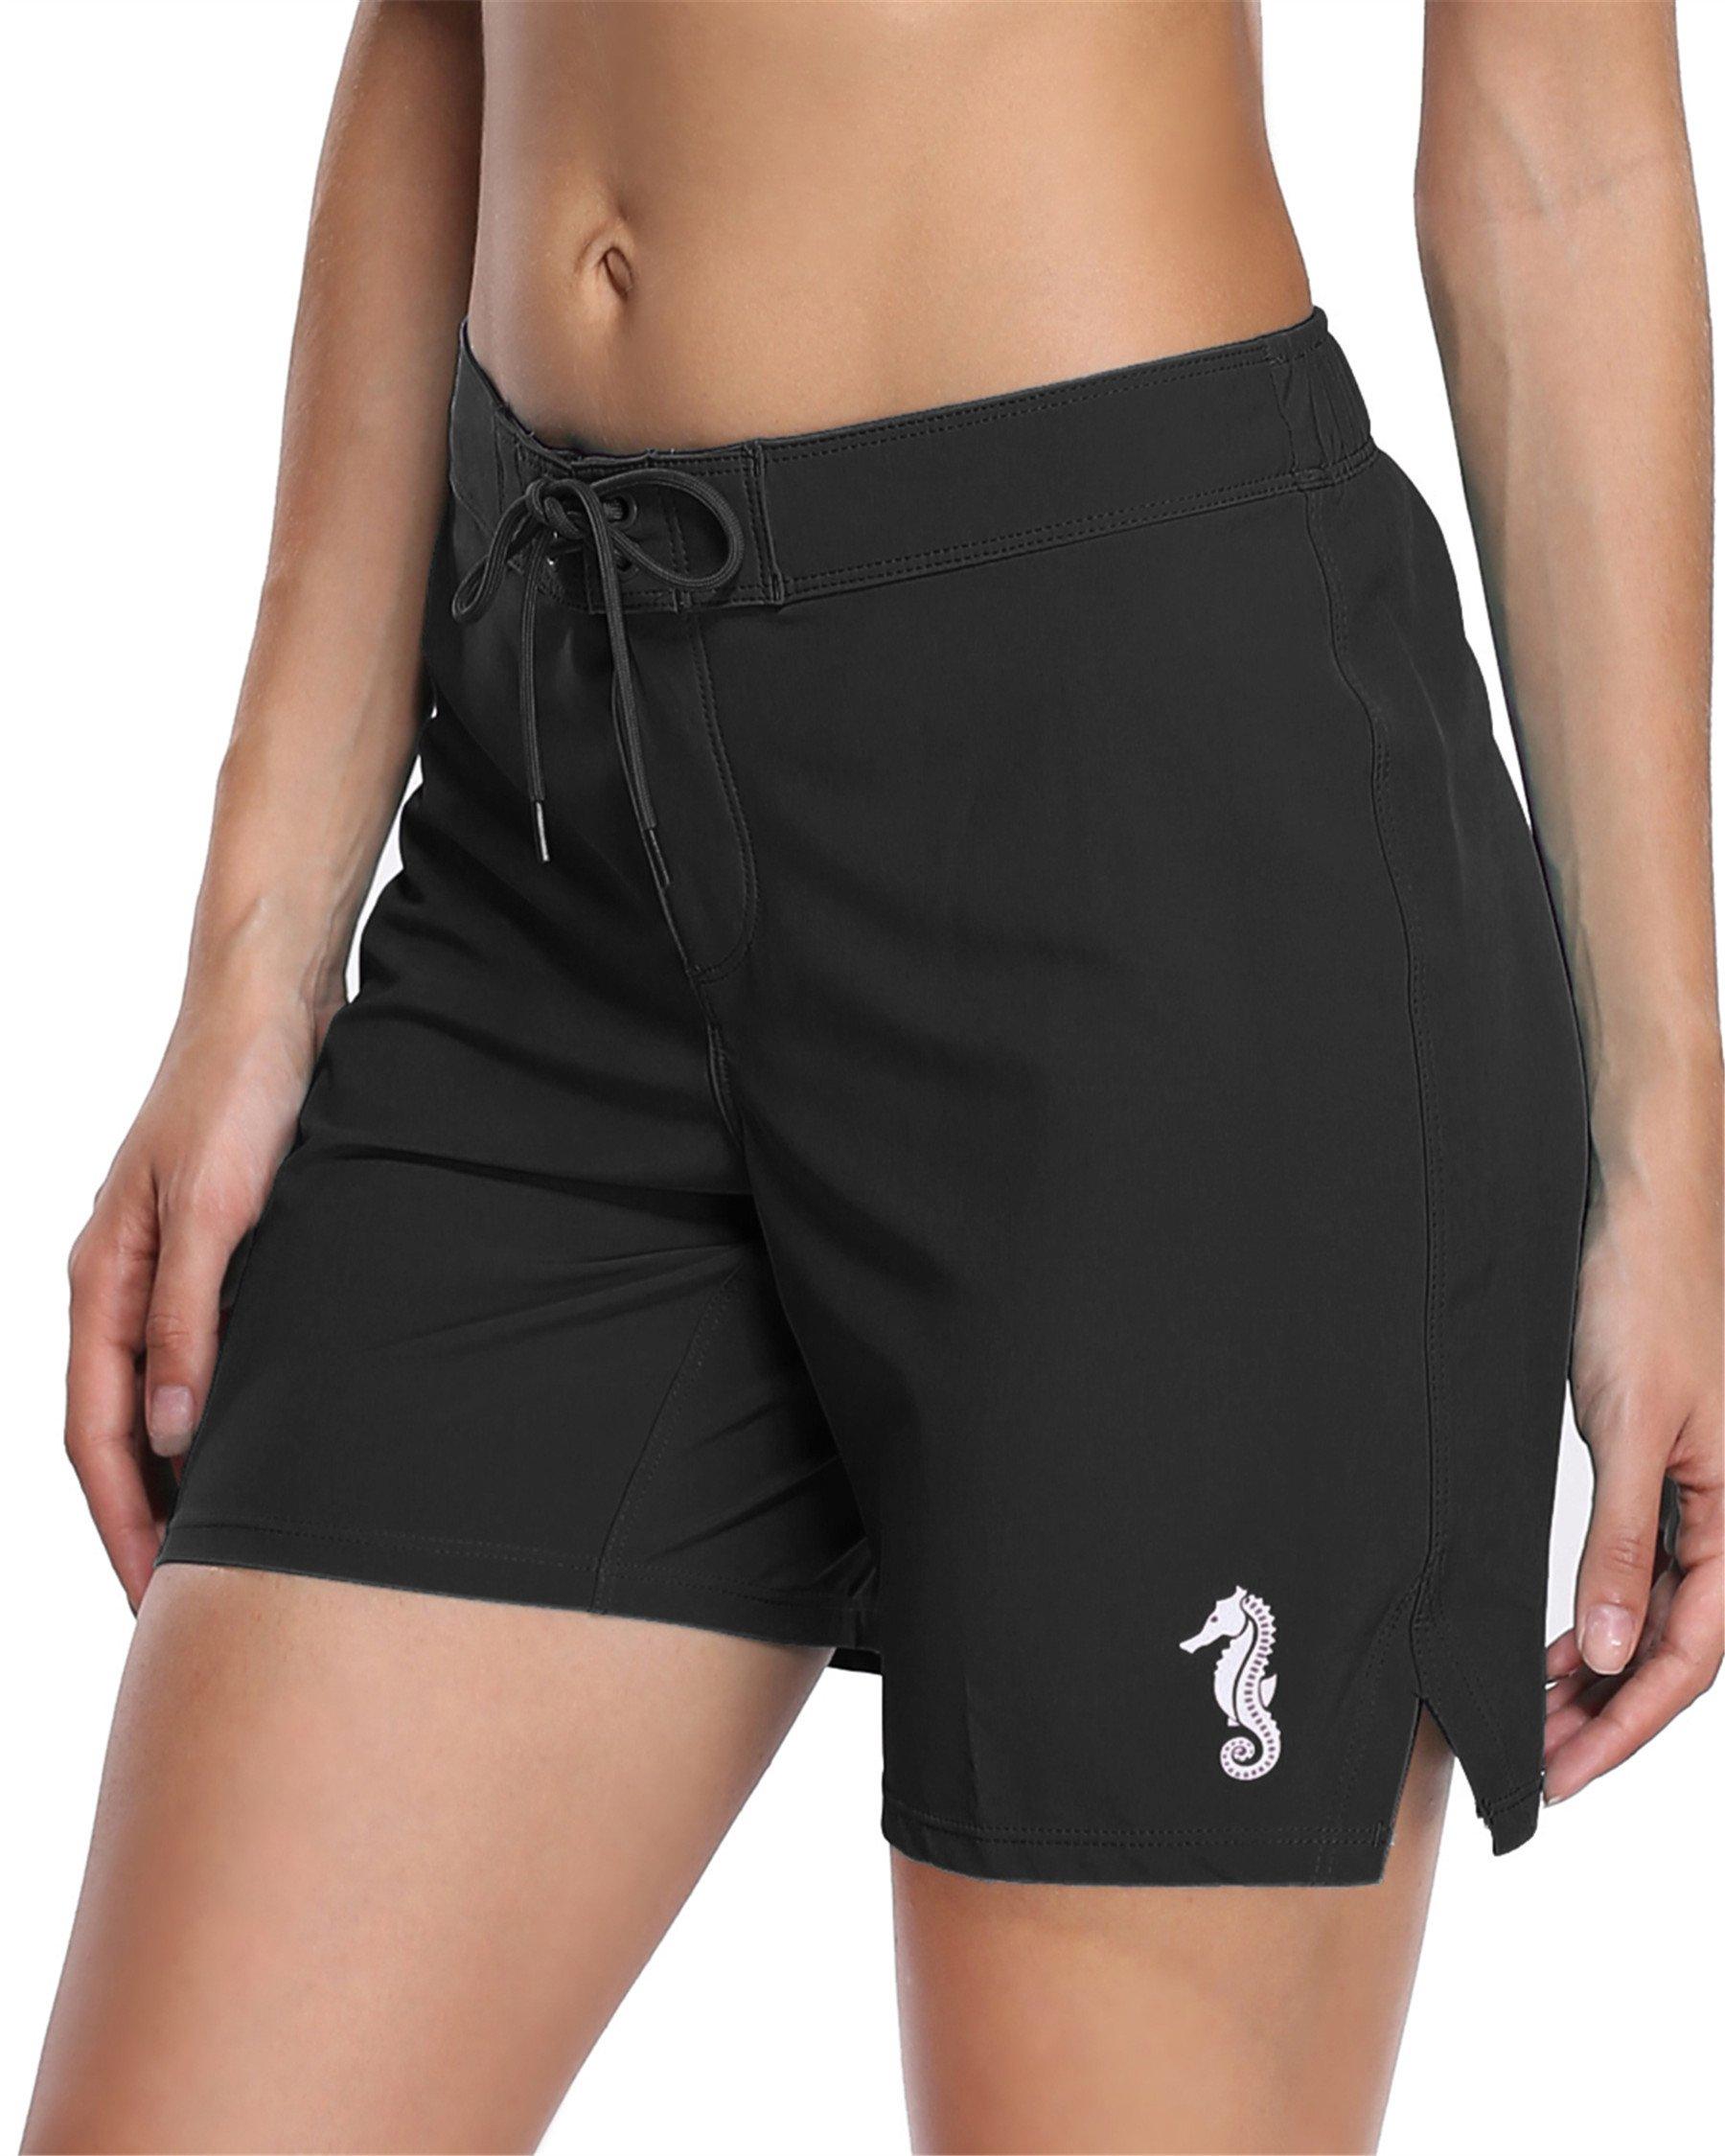 Maysoul Women Swim Shorts Surf Short Beach Bottom Bathing Suits Black XXXL